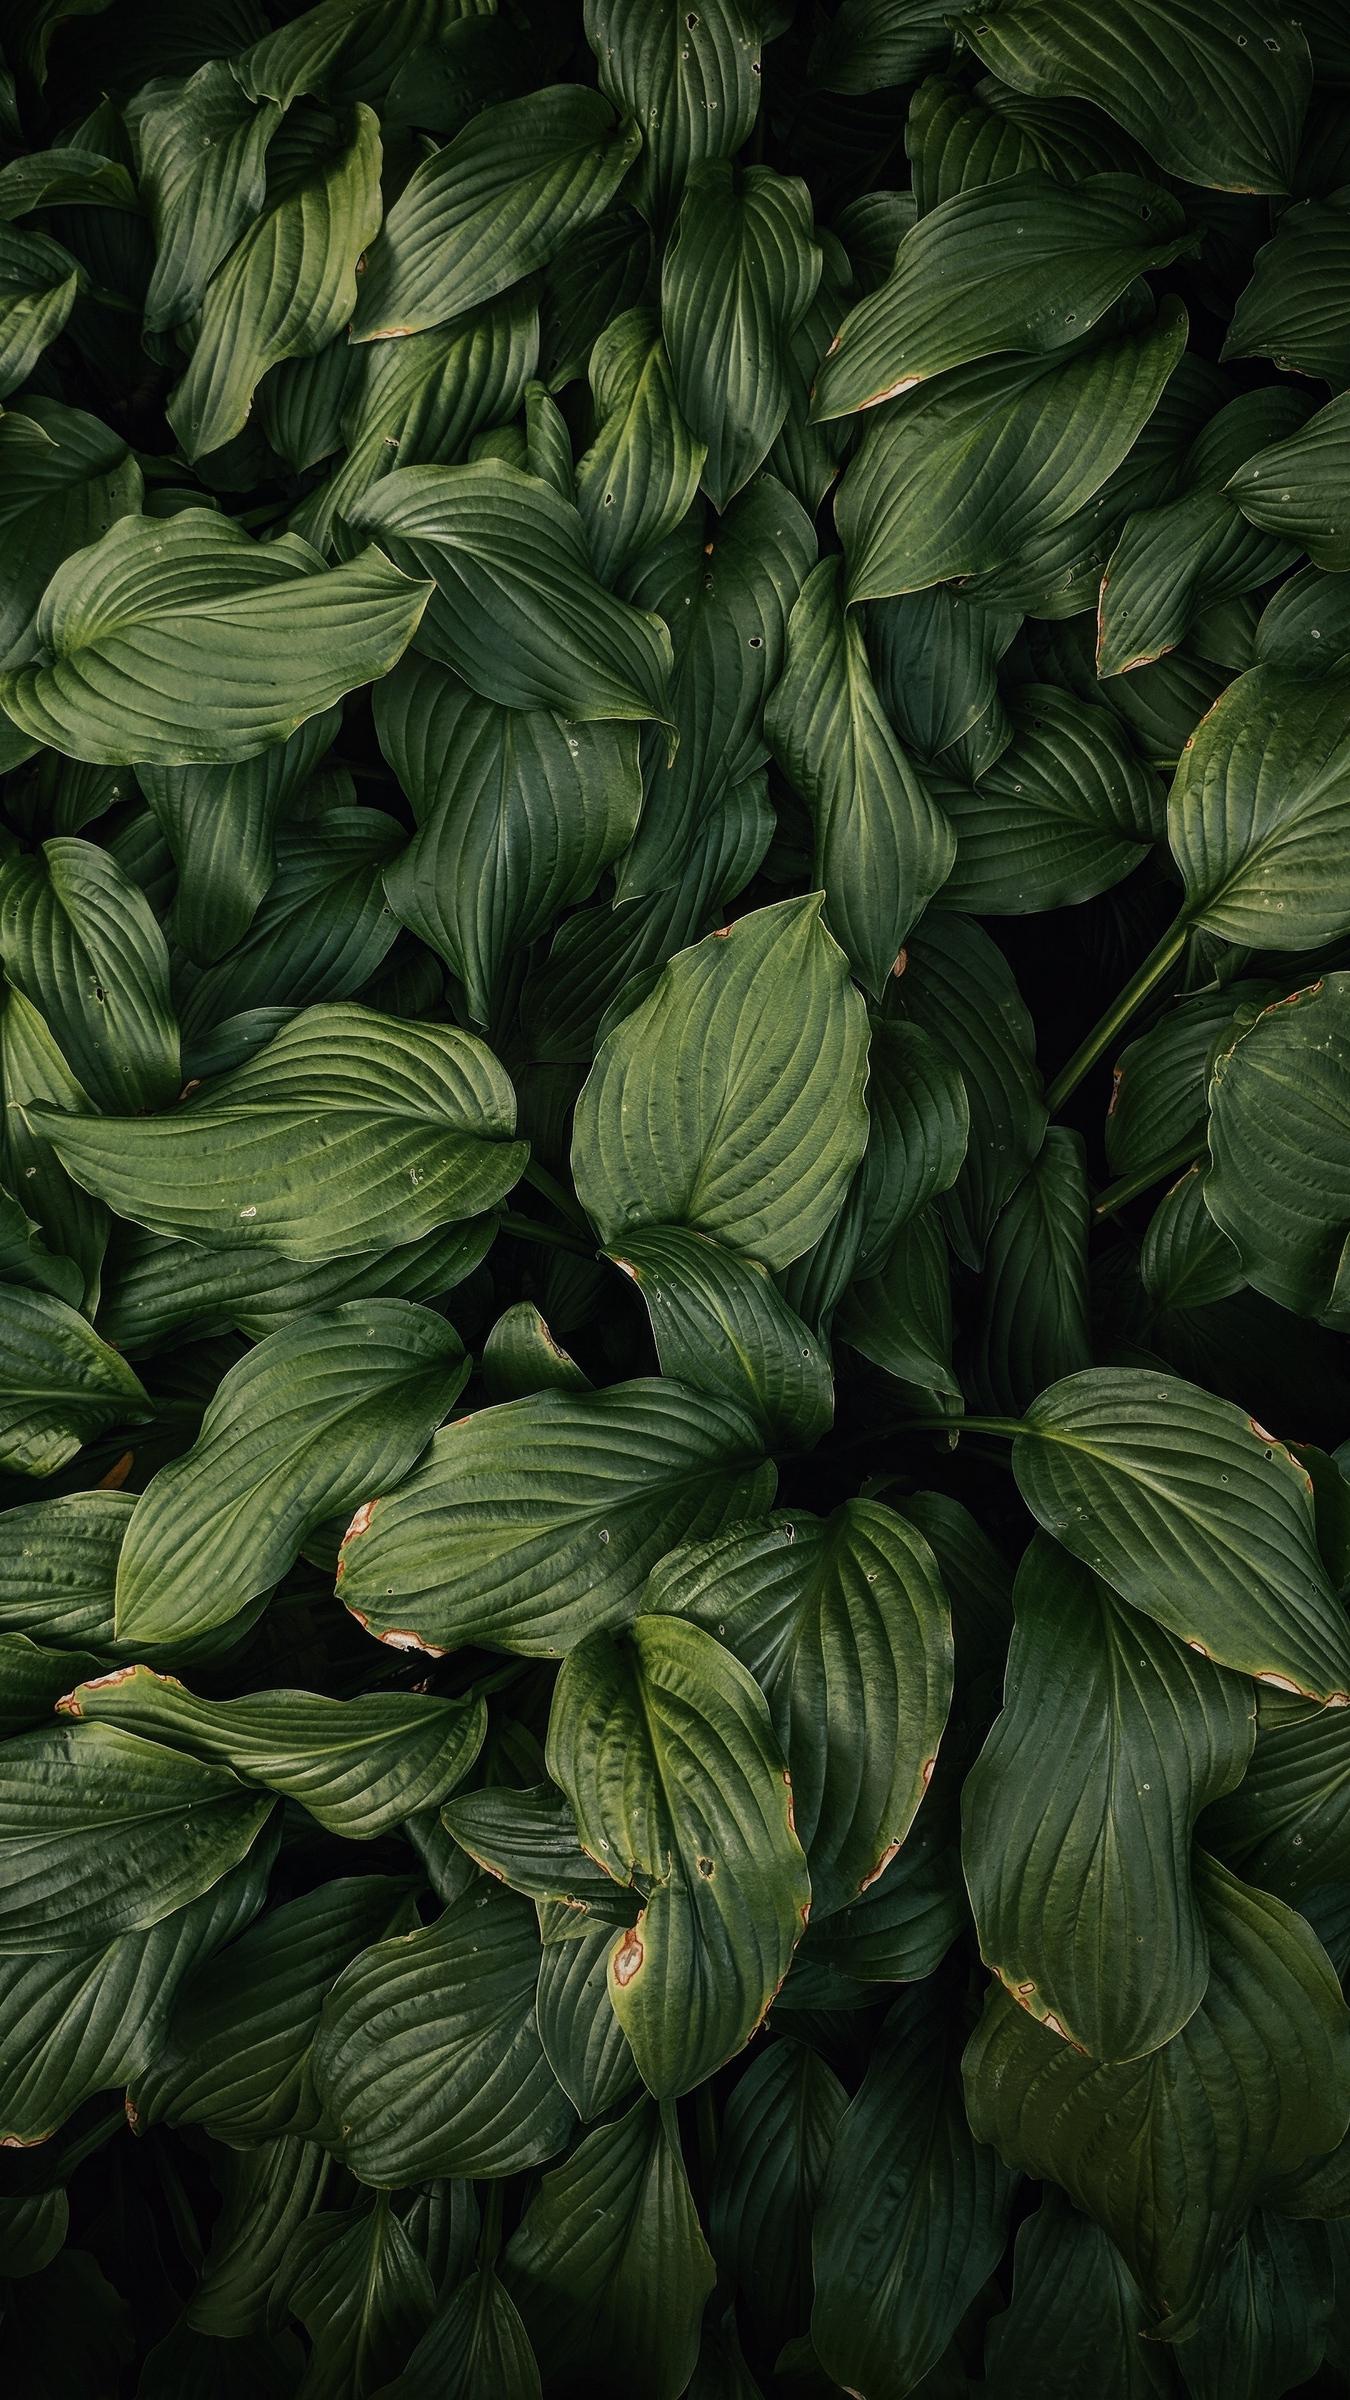 Wallpaper Leaves Plant Green Dark Green Dark Green Plant Background 2946770 Hd Wallpaper Backgrounds Download